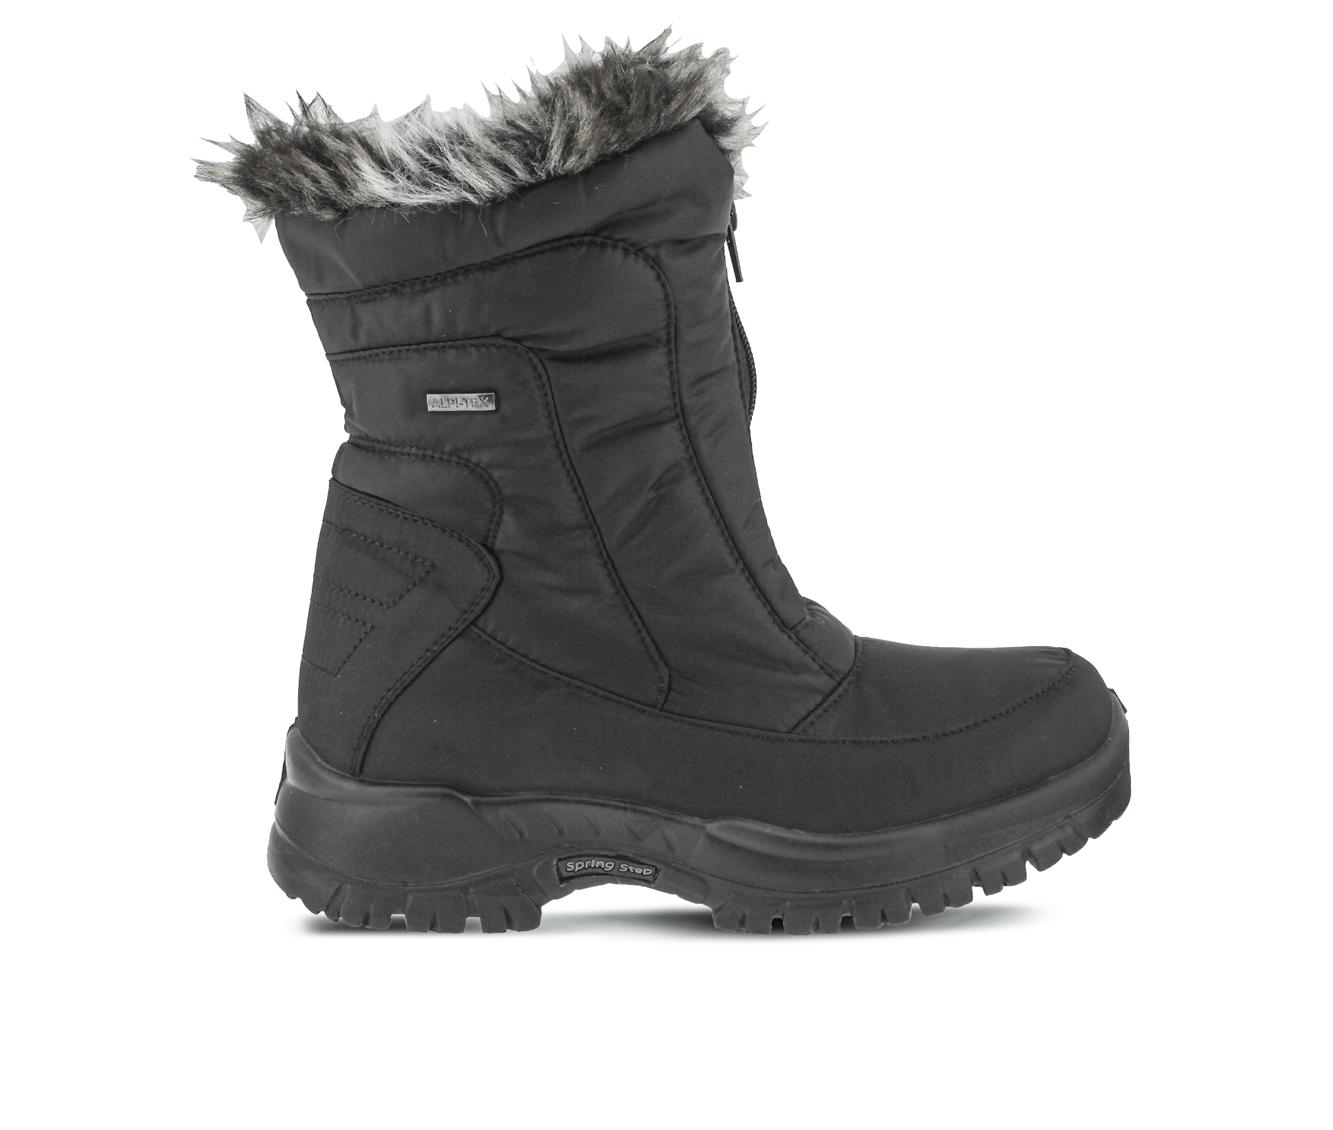 Flexus Zigzag Women's Boots (Black Canvas)